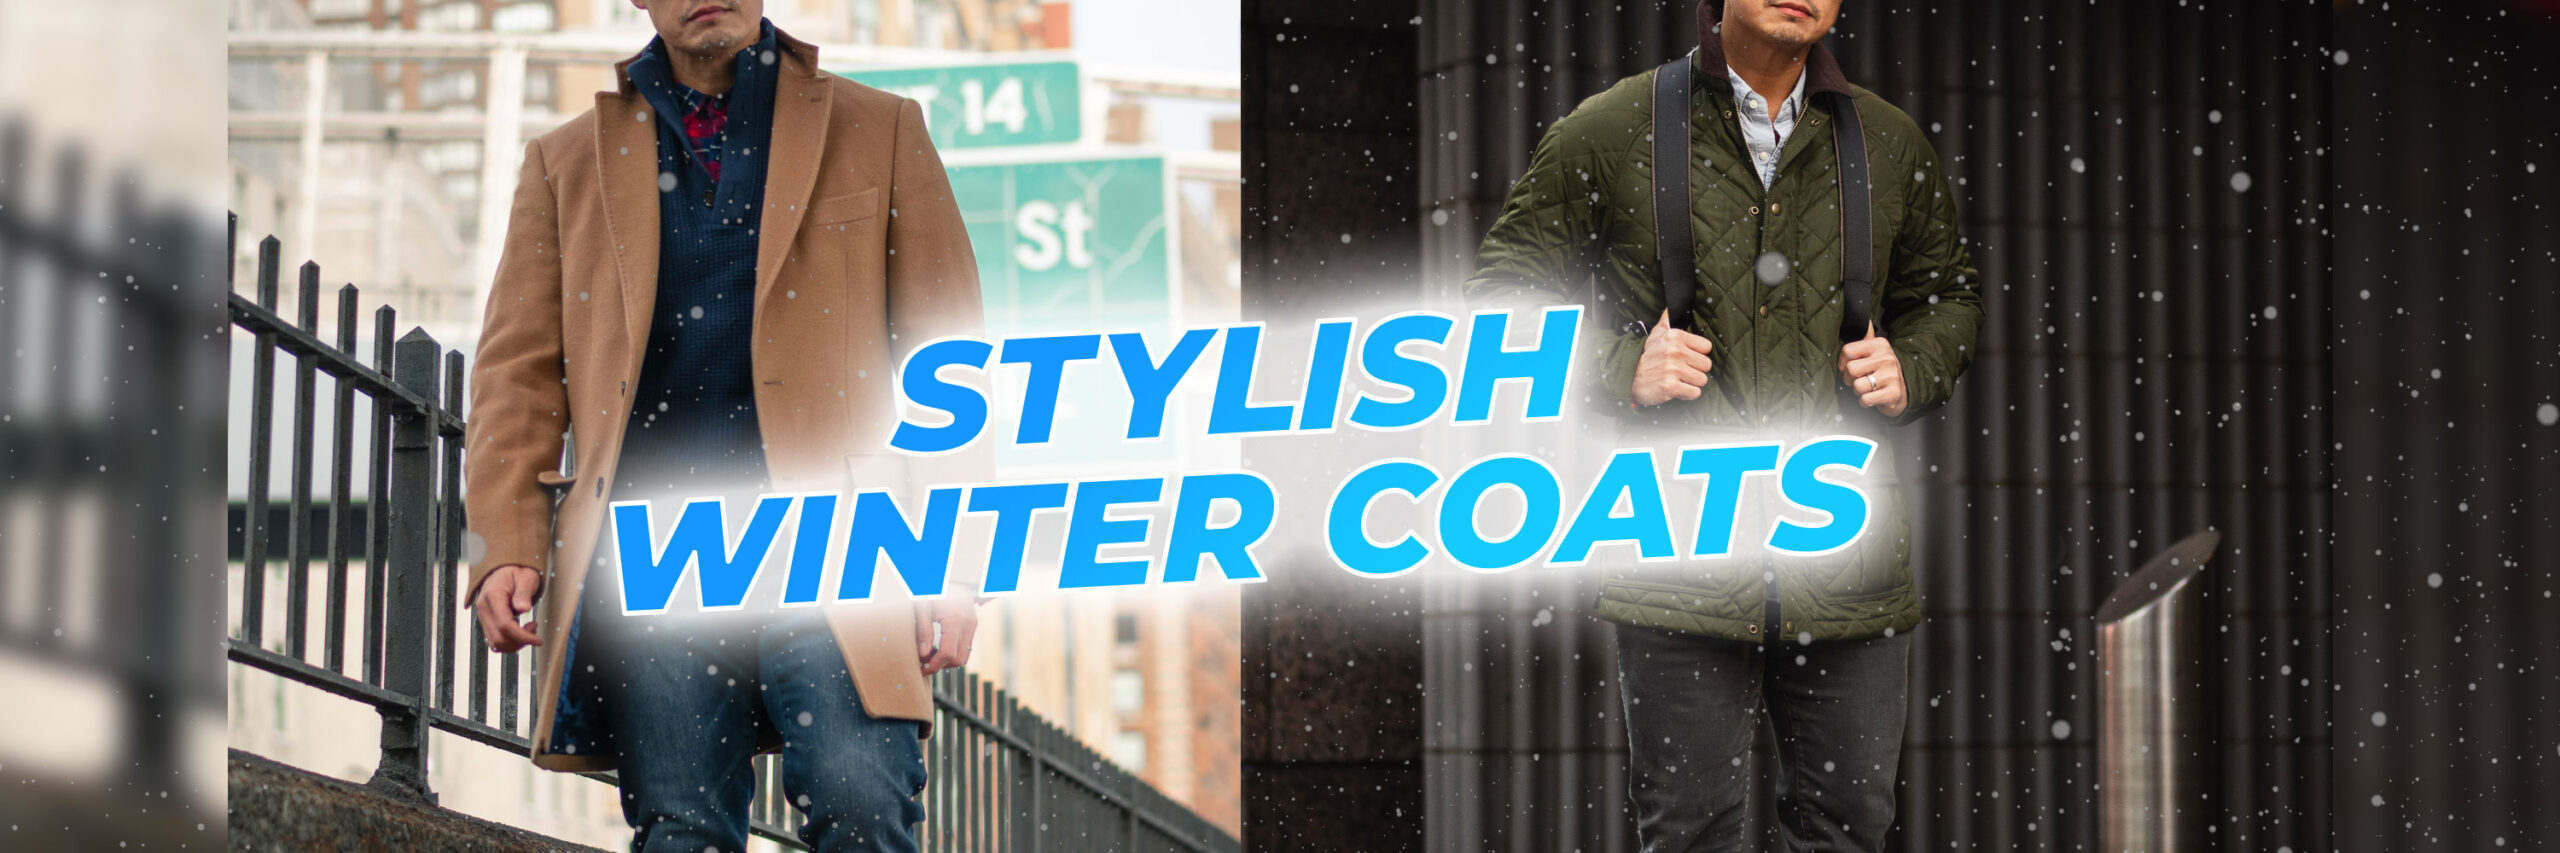 stylish warm winter coats effortless gent